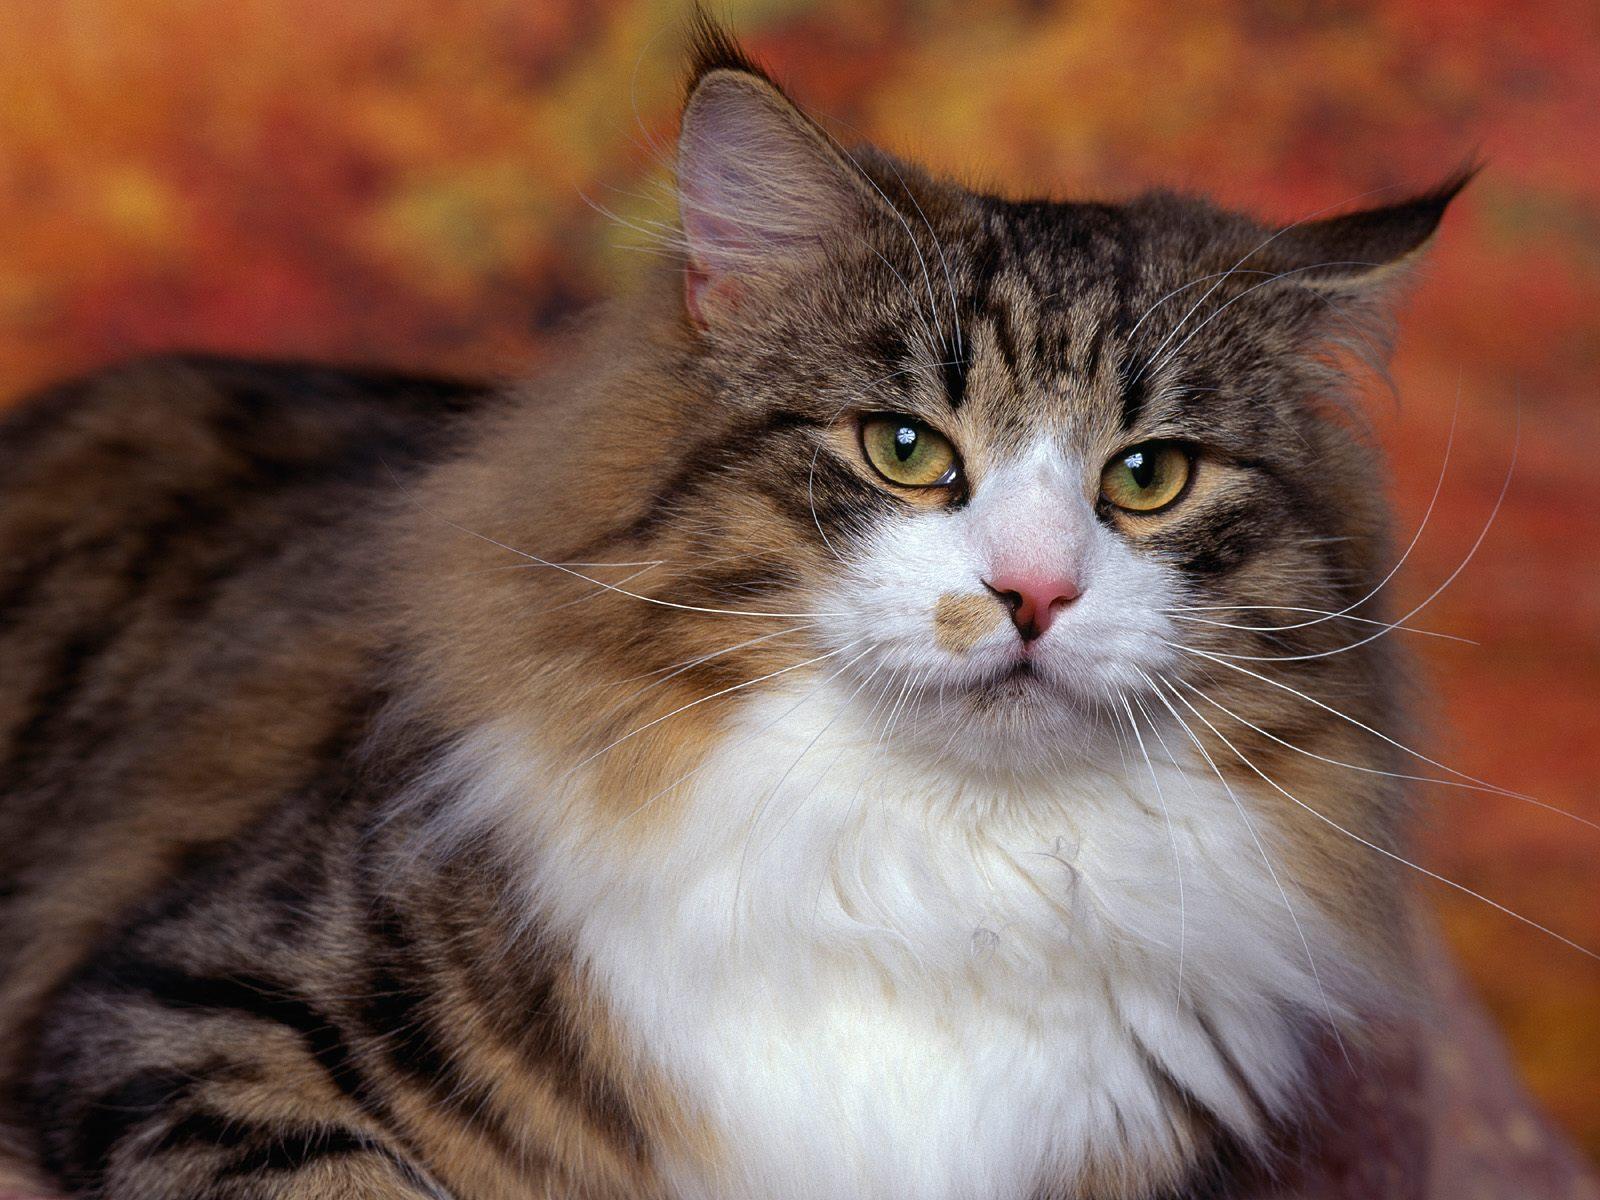 Cat Wallpaper Cute Cat Pictures Animal Desktop 1600x1200